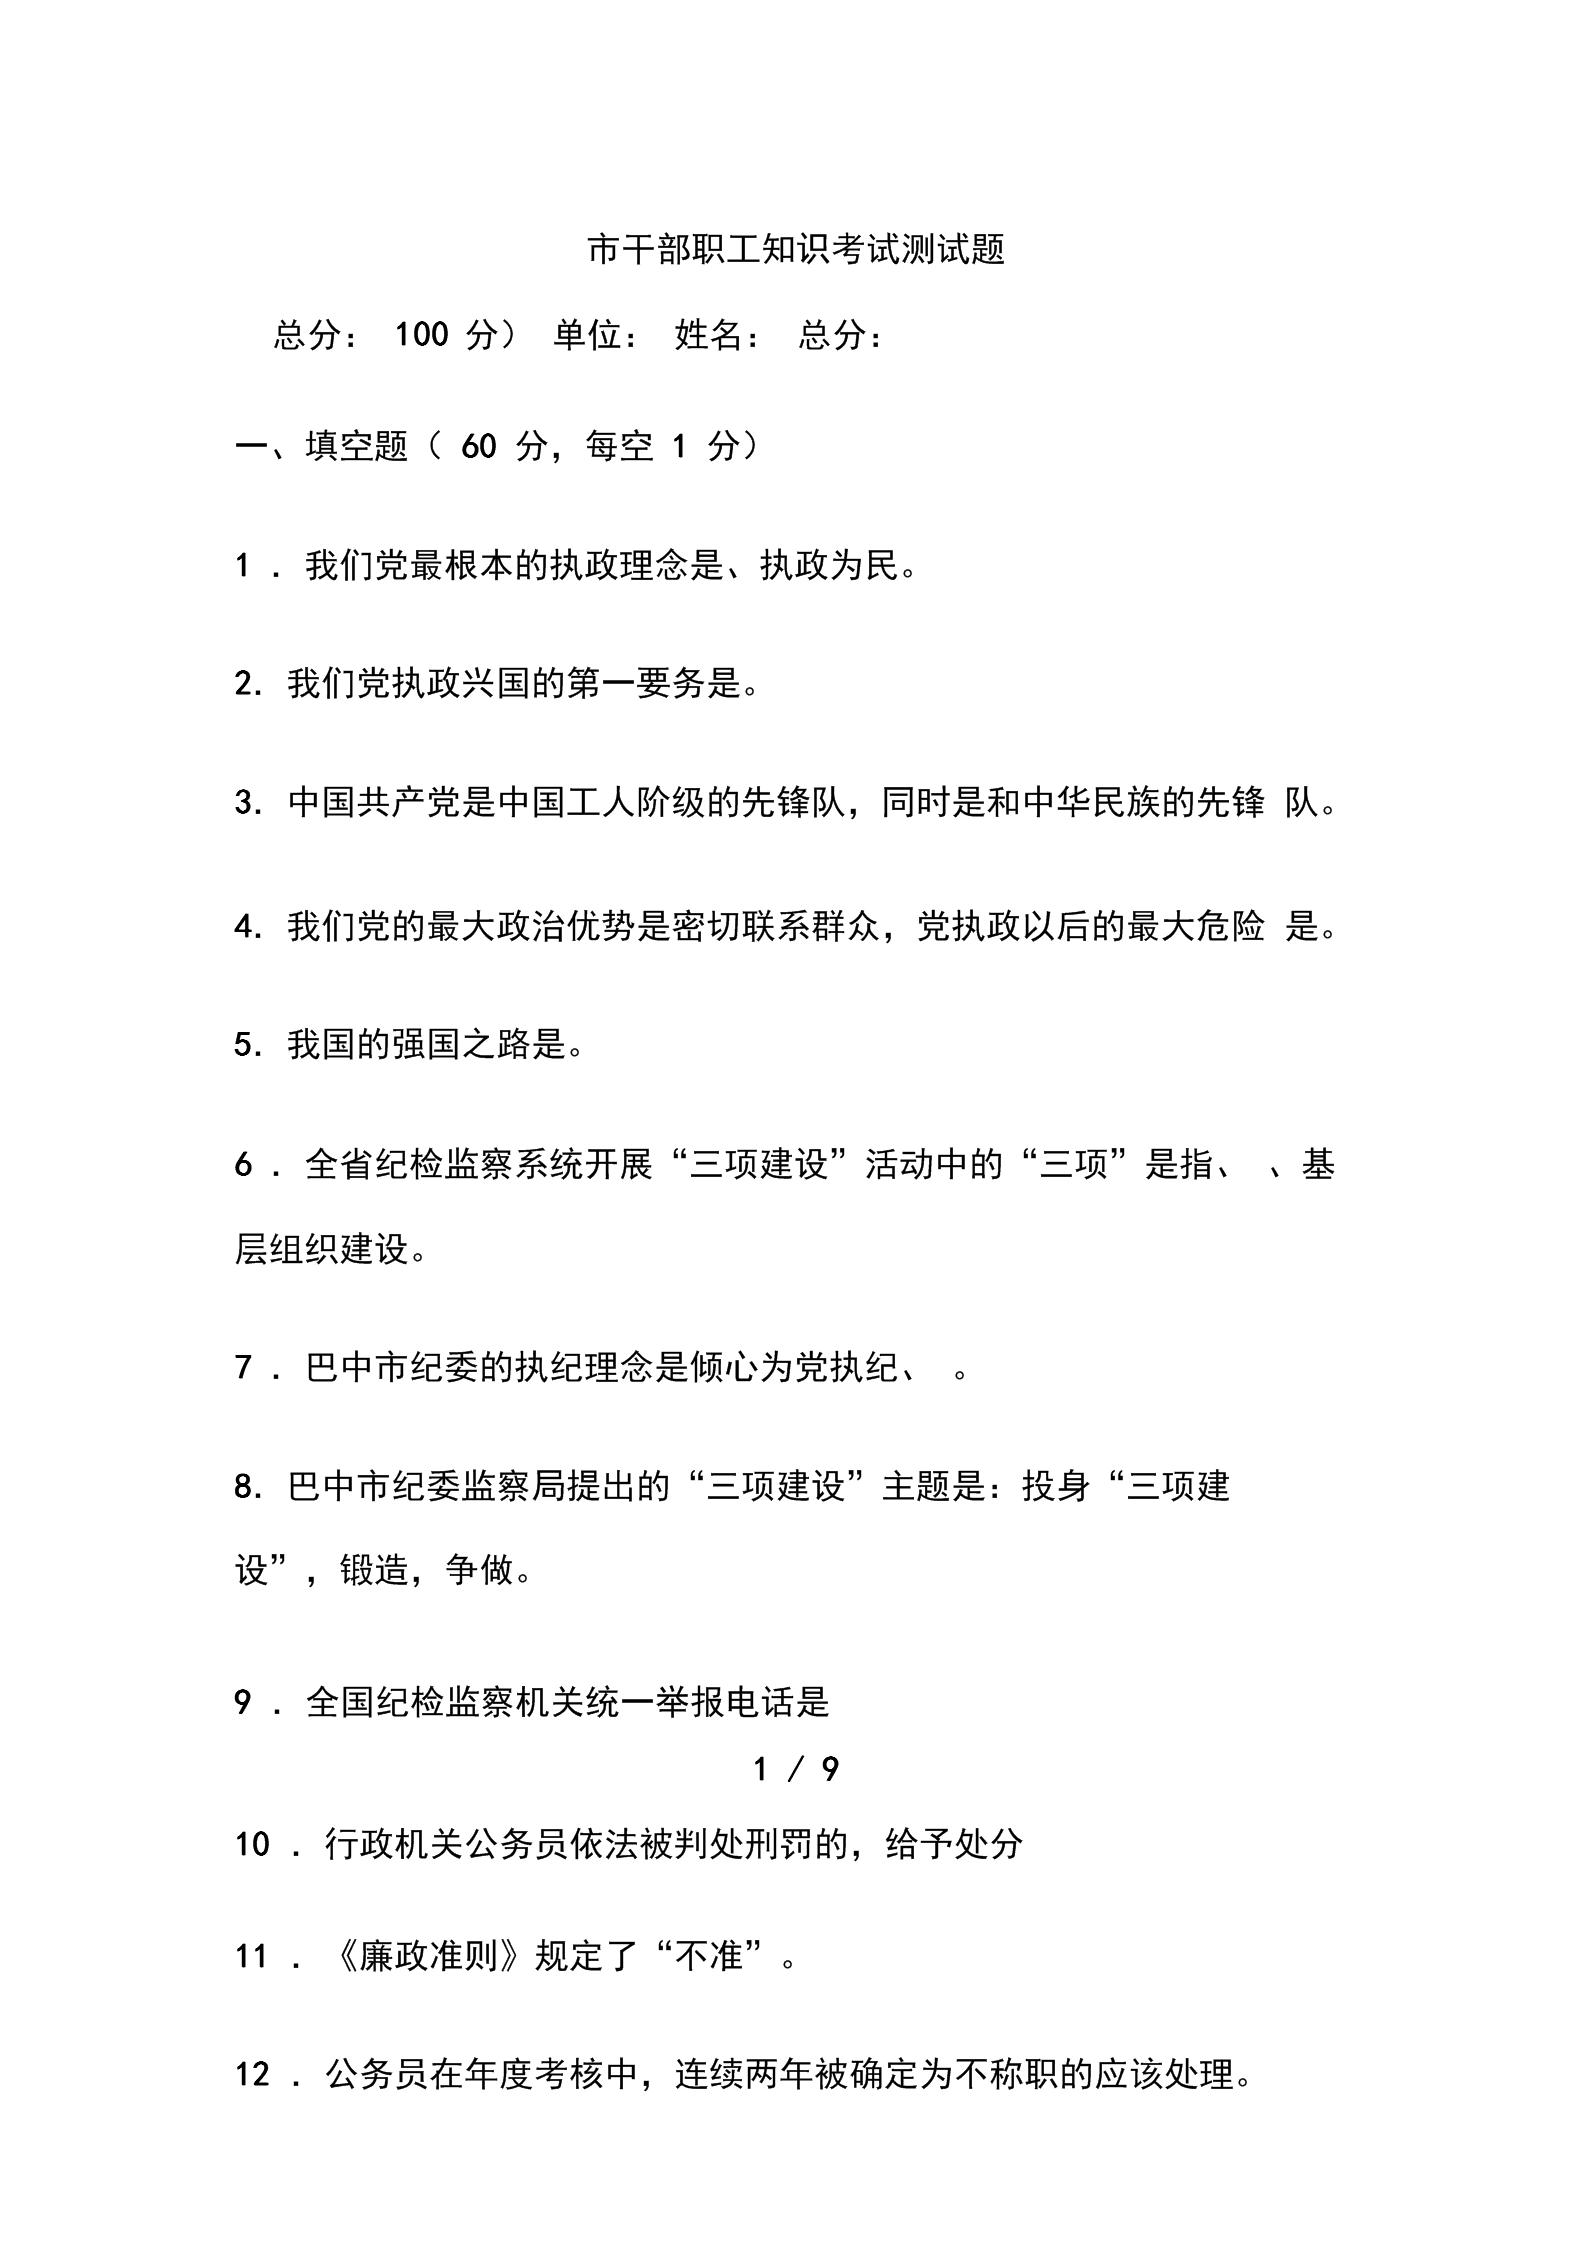 XX市干部职工知识考试测试题.docx